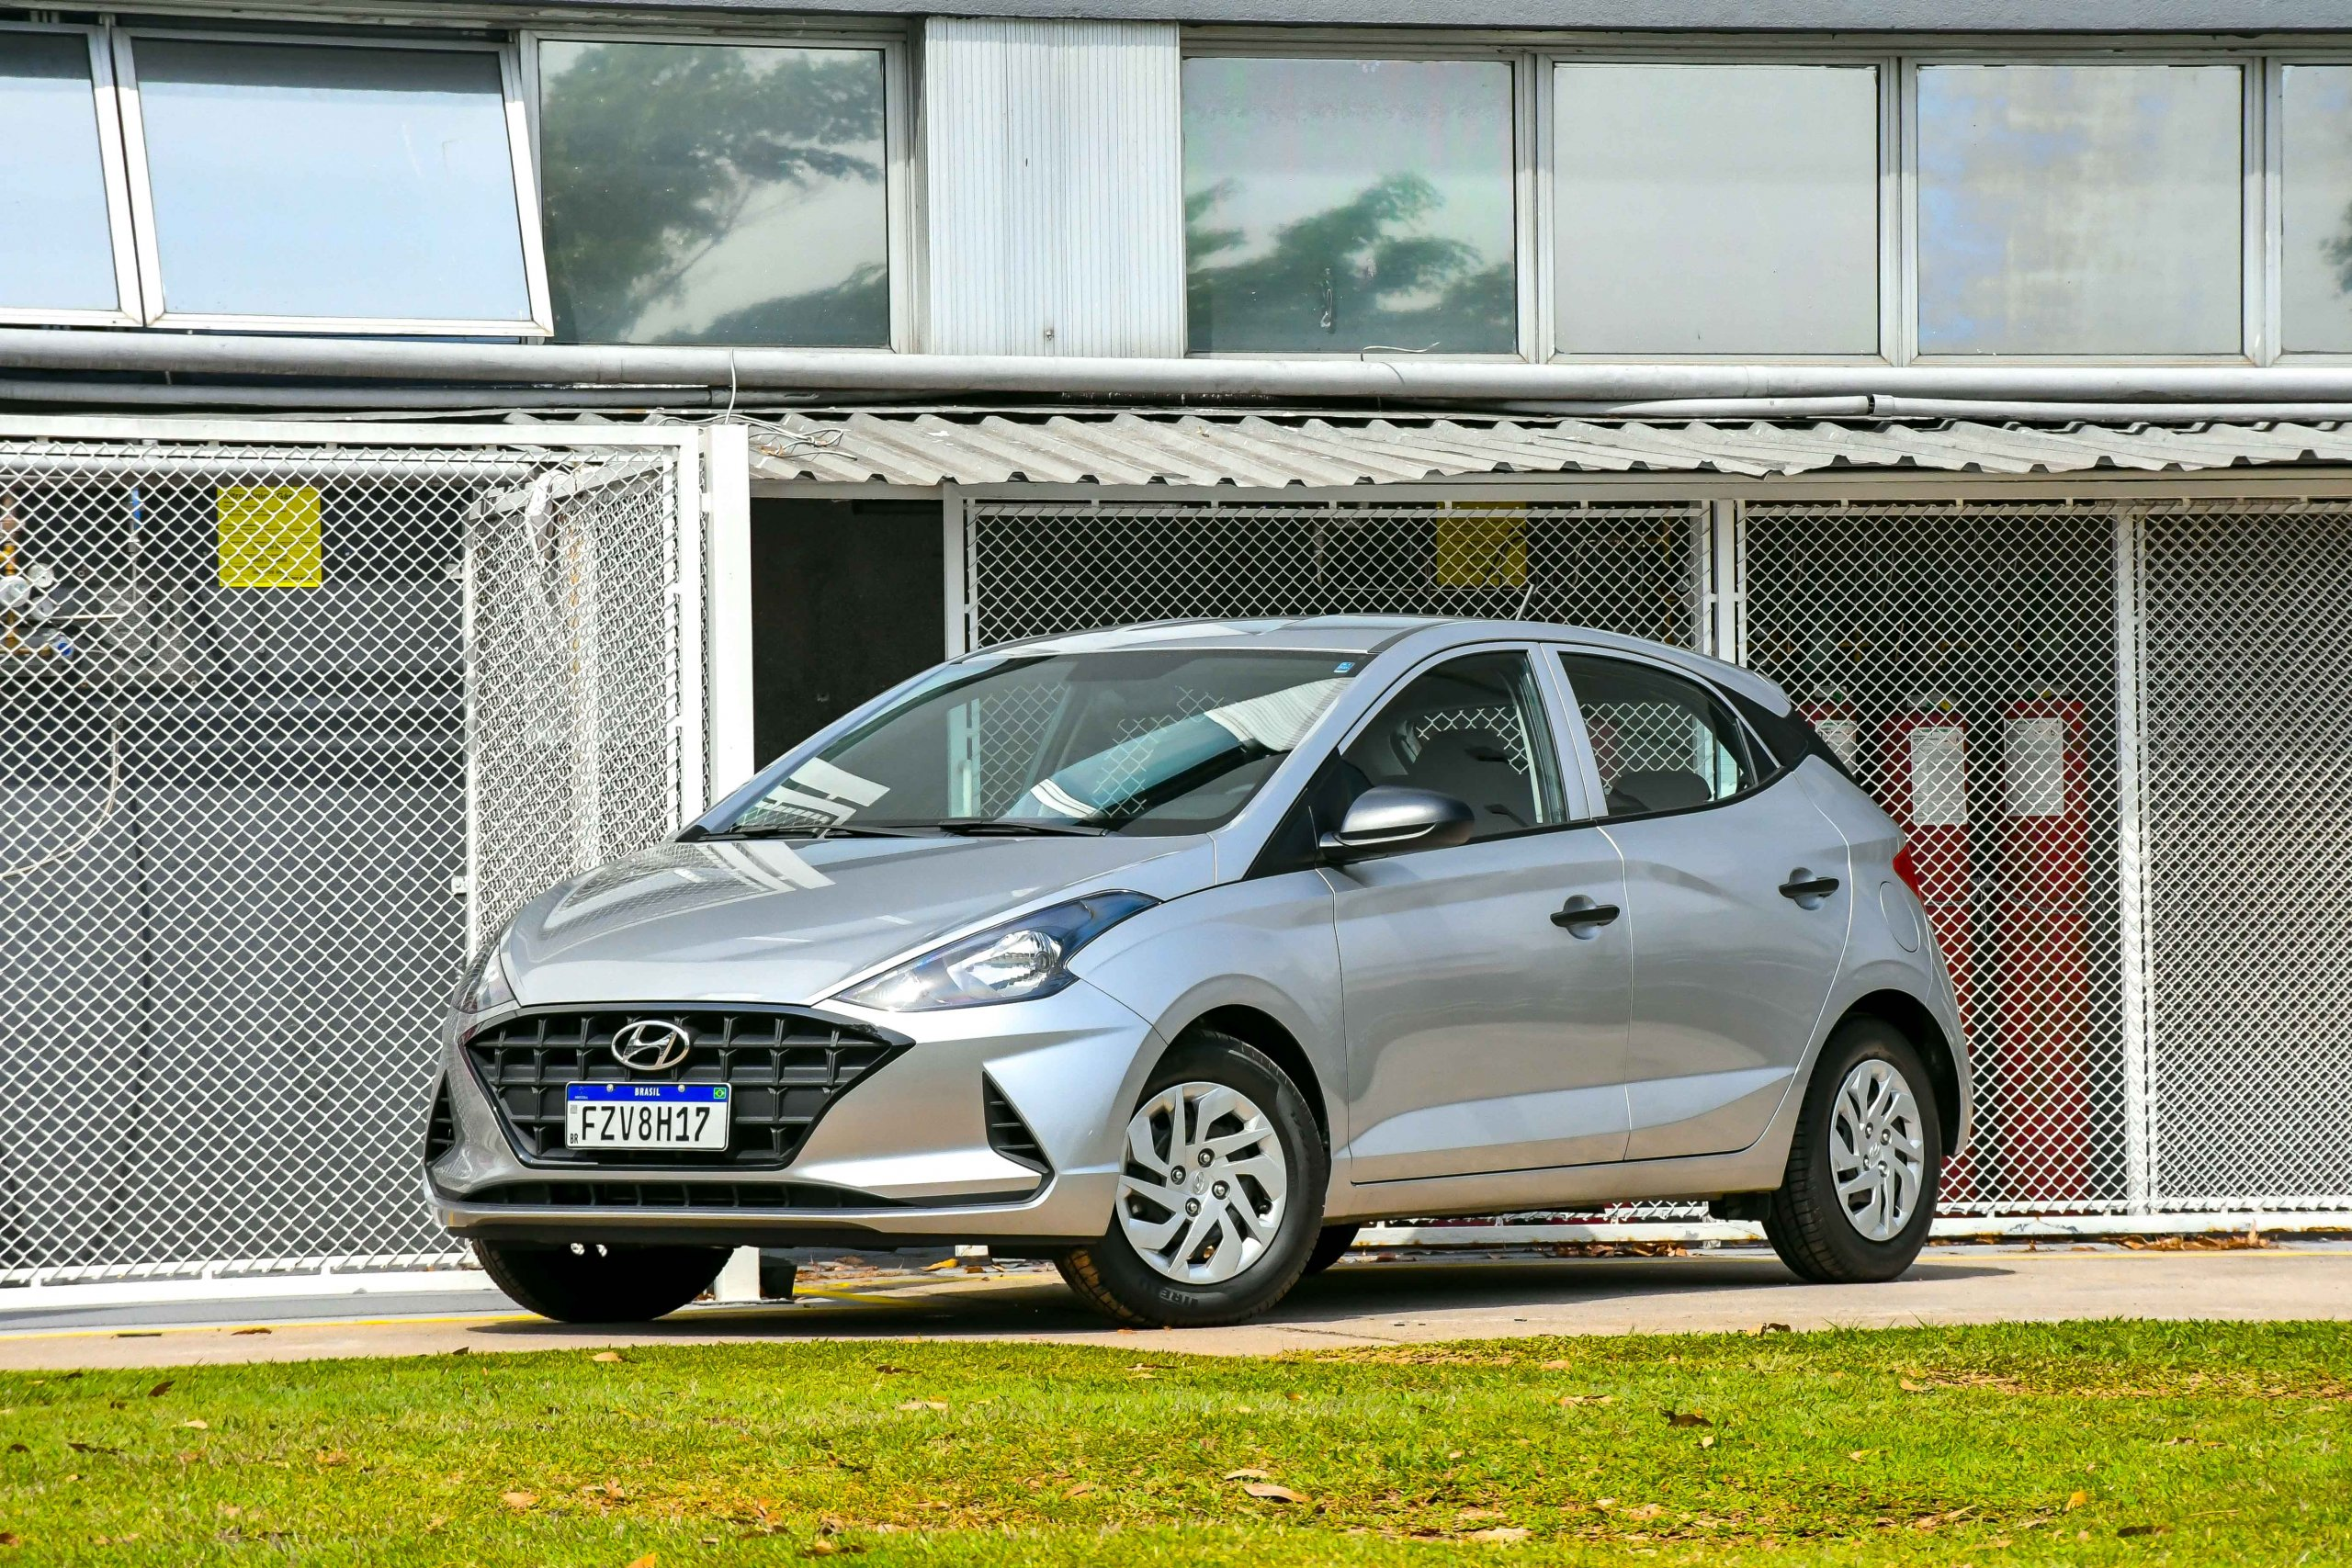 Hyundai Hb20 Evolution 1.0 1293